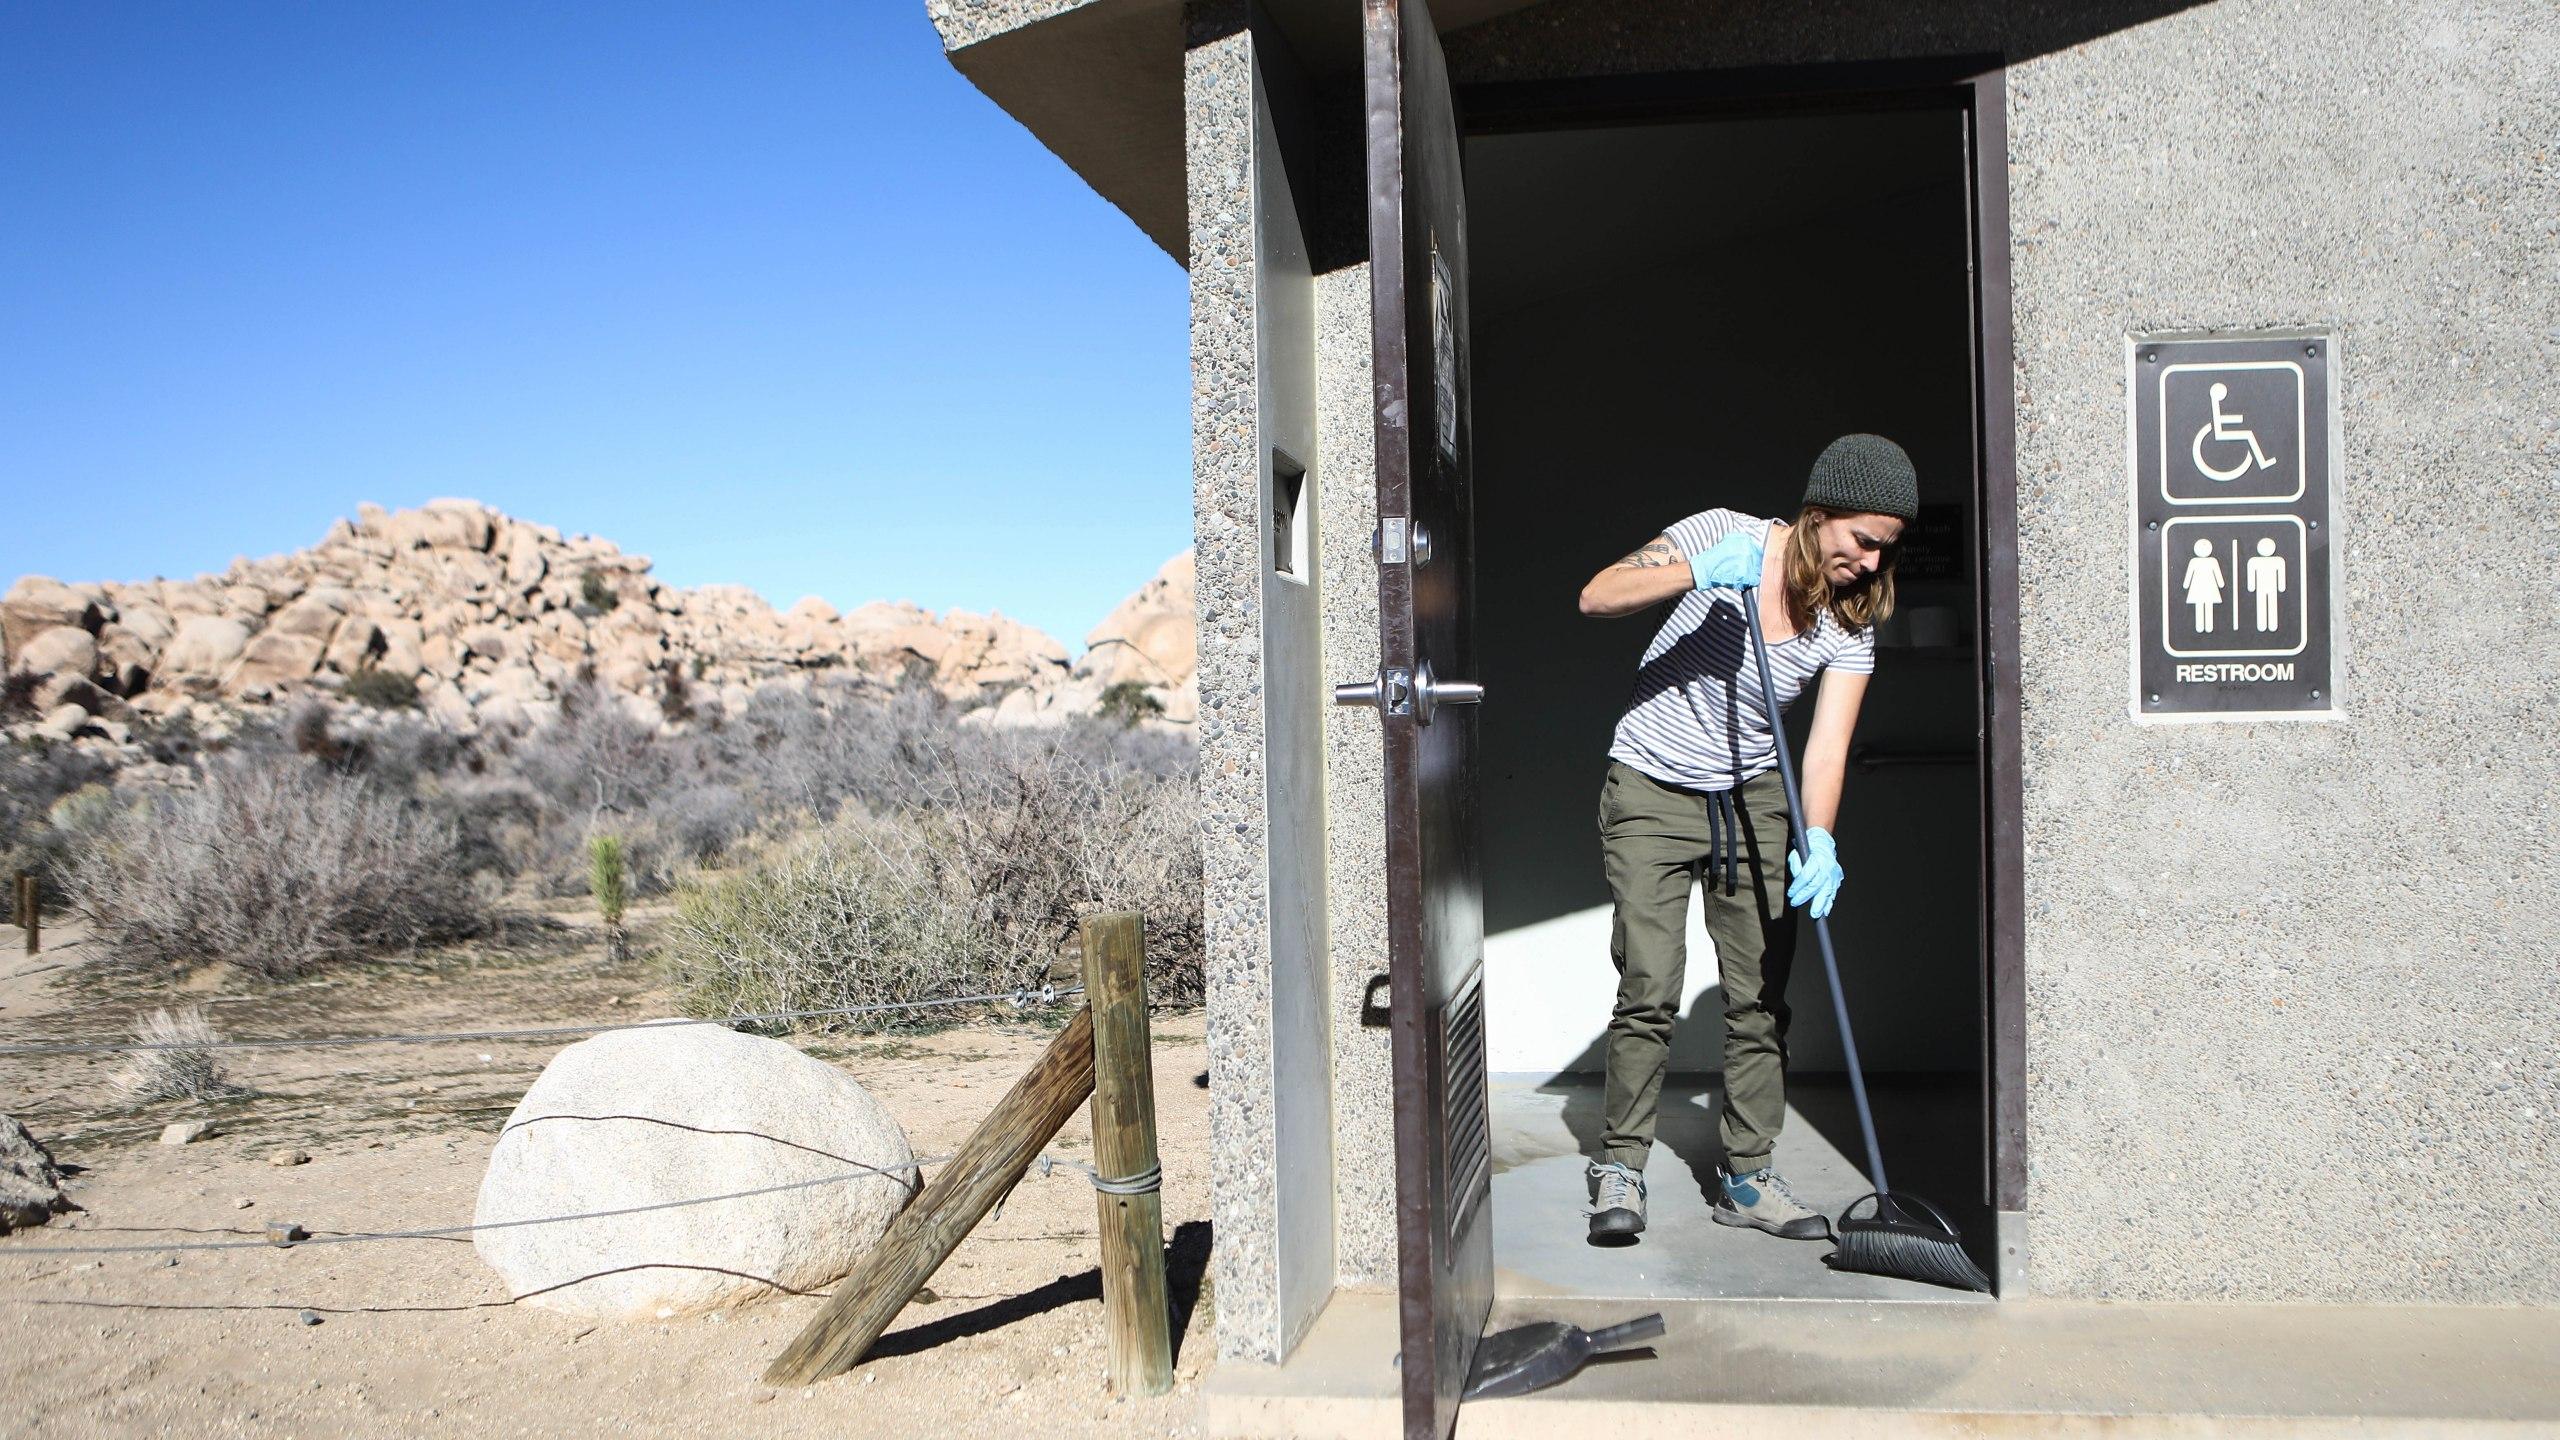 Volunteer Alexandra Degen cleans a restroom at Joshua Tree National Park on January 4, 2019 in Joshua Tree National Park, California. (Credit: Mario Tama/Getty Images)